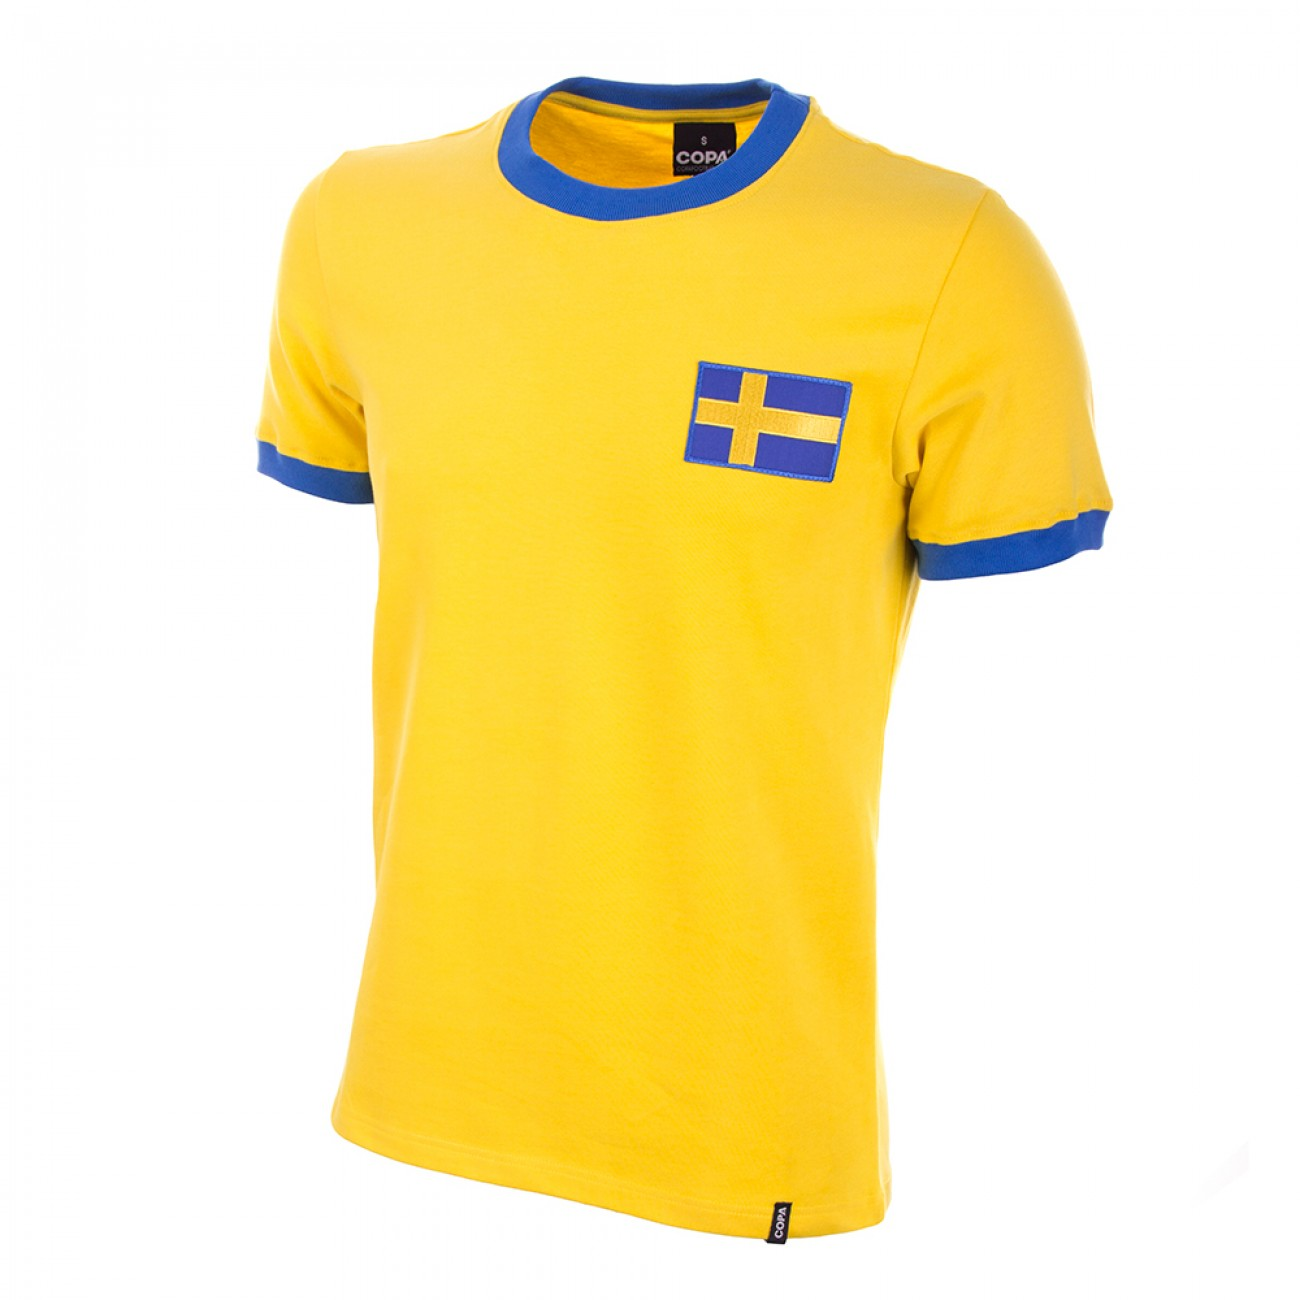 http://www.retrofootball.es/ropa-de-futbol/camiseta-suecia-a-os-70.html